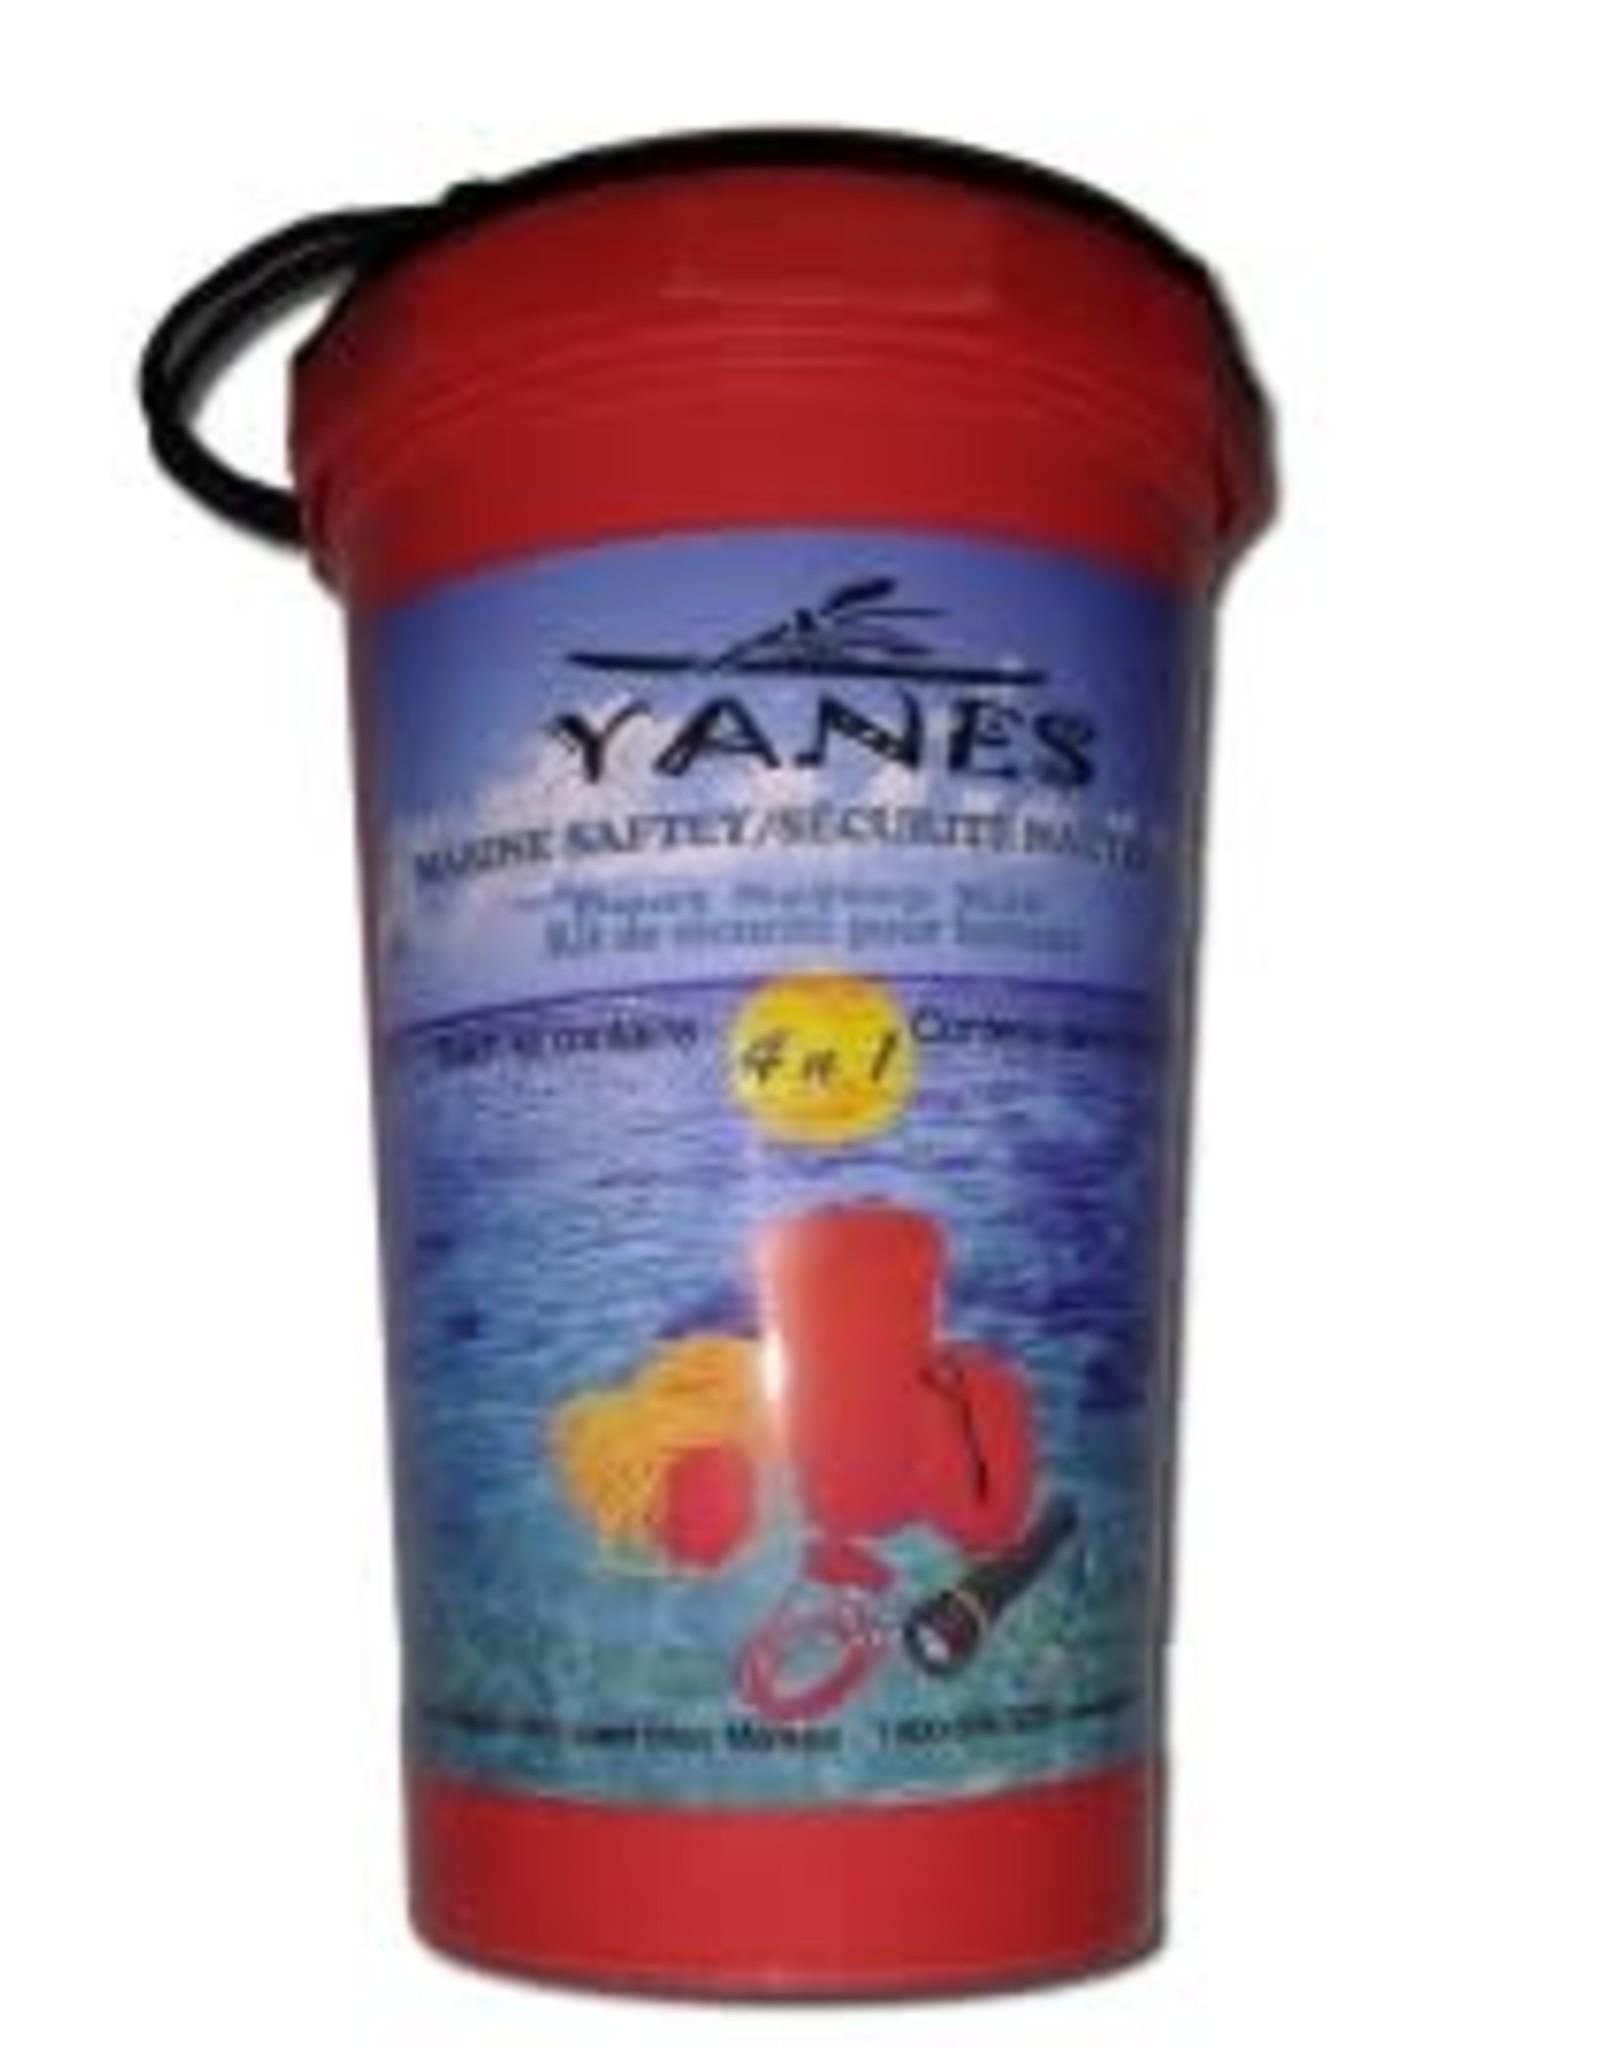 Yanes Yanes water sports safety kit